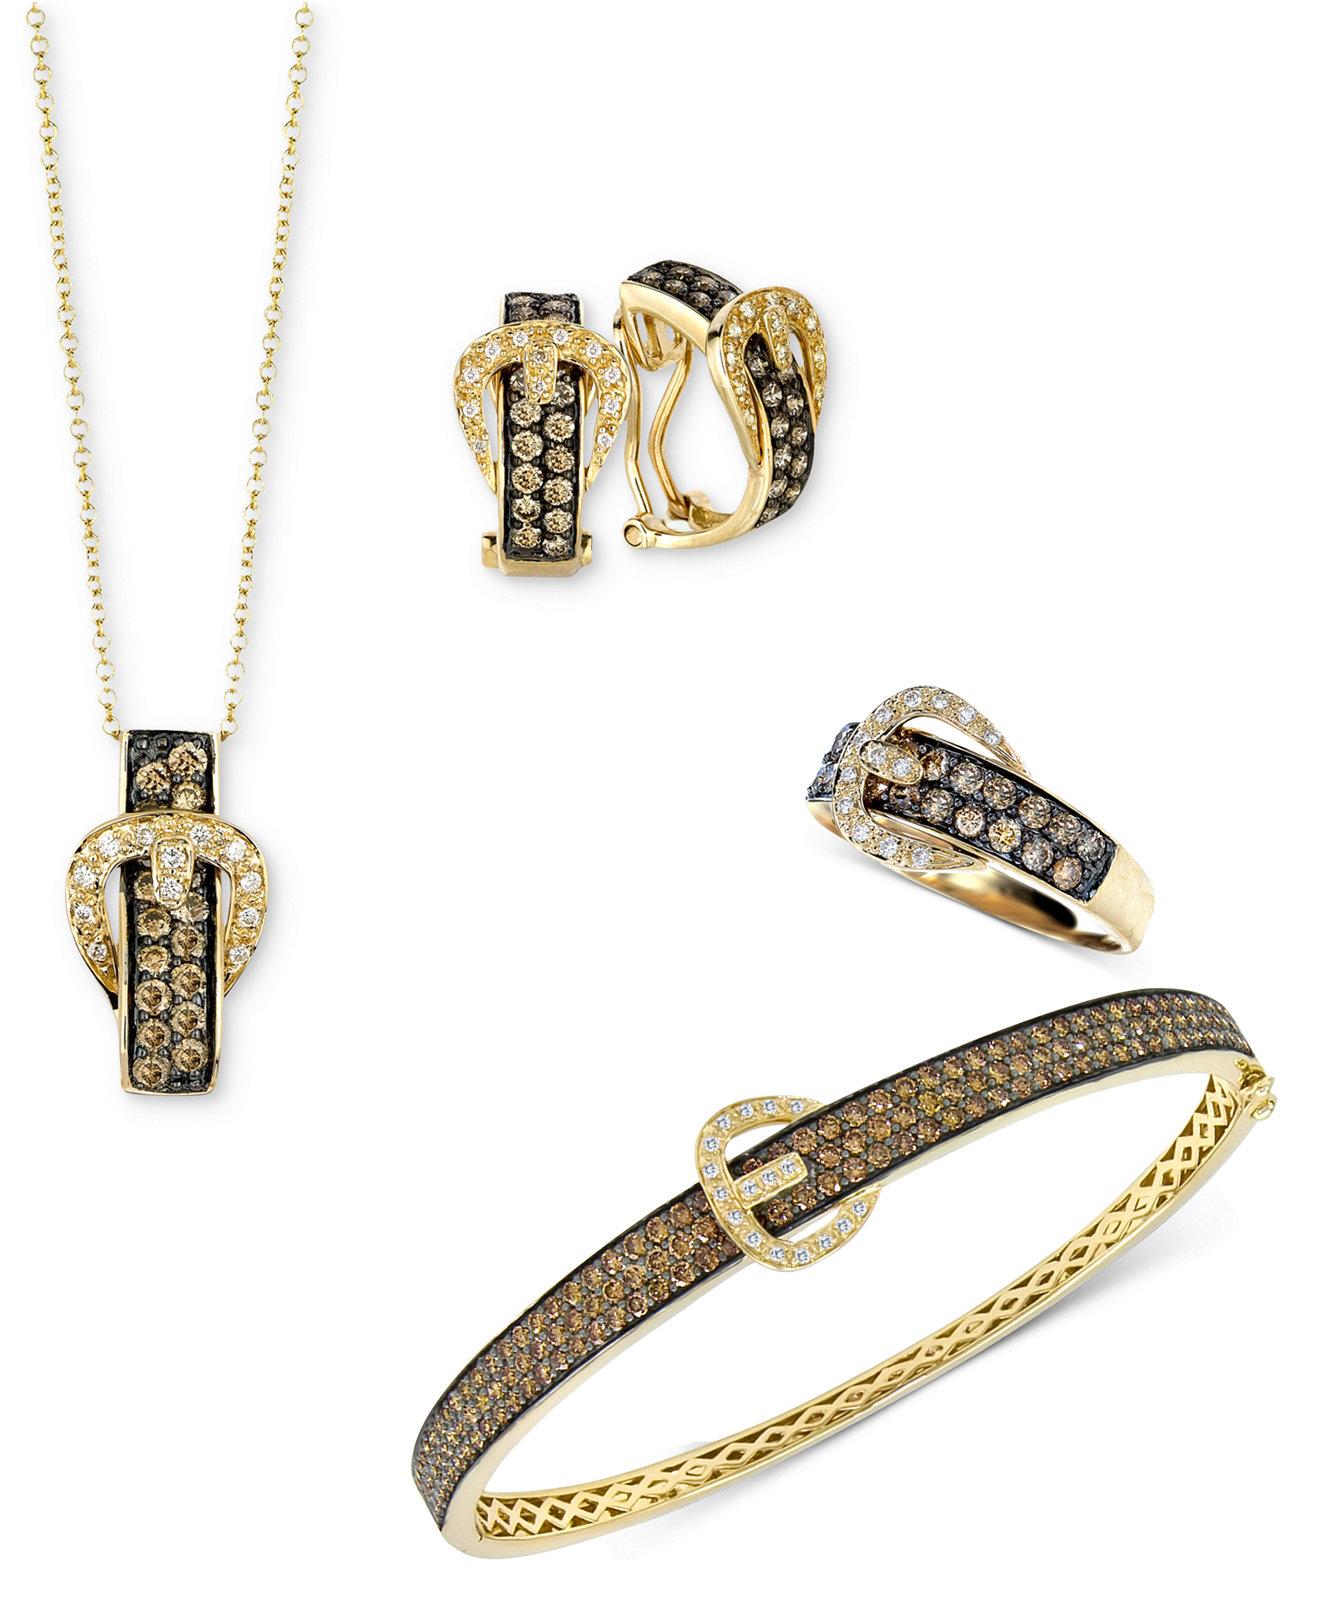 Le Vian Jewelry Chocolate Diamond Buckle Jewelry Ensemble In 14k Gold   Jewelry & Watches  Macy's